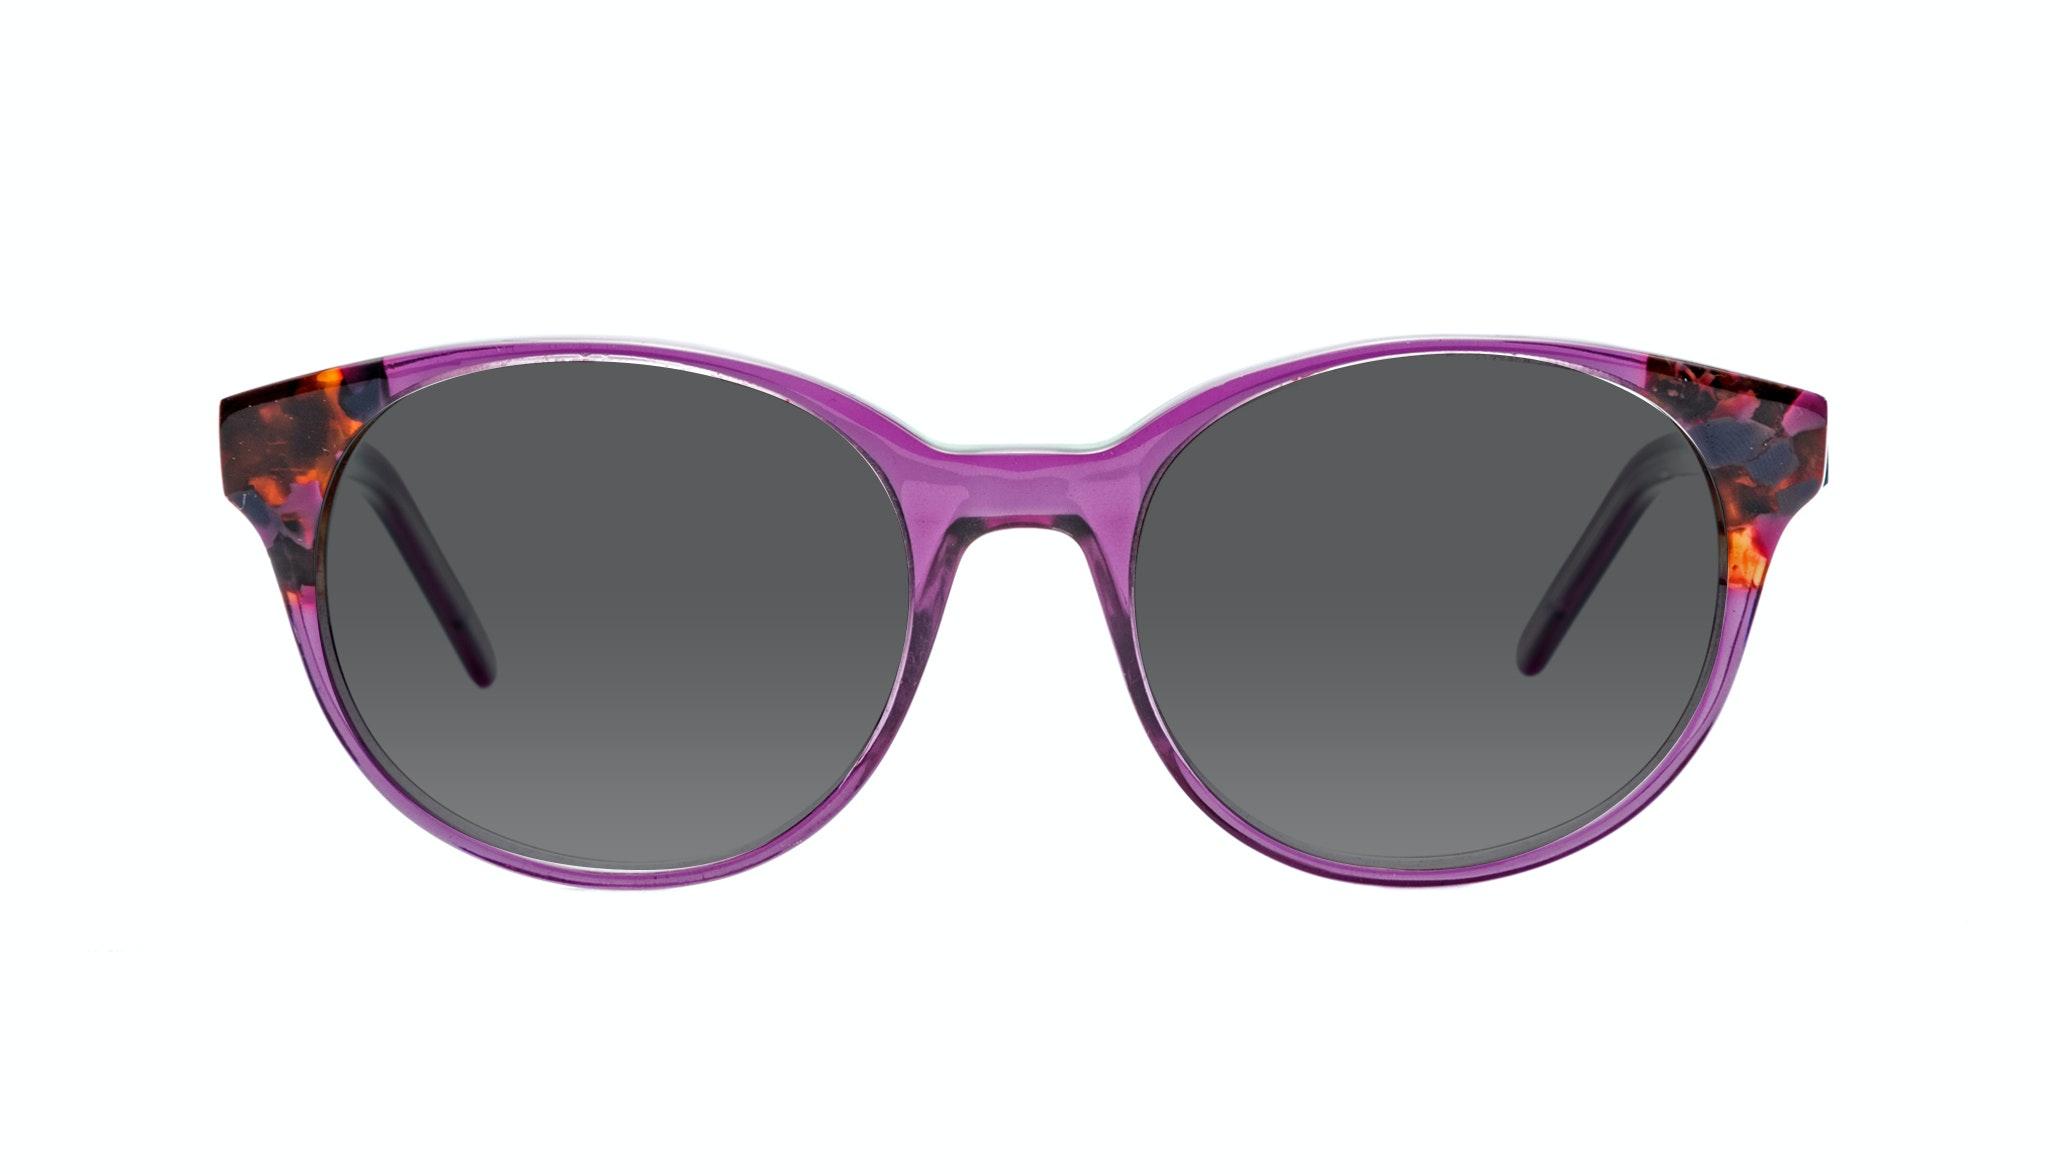 Affordable Fashion Glasses Round Sunglasses Women Bis Pretty Purple